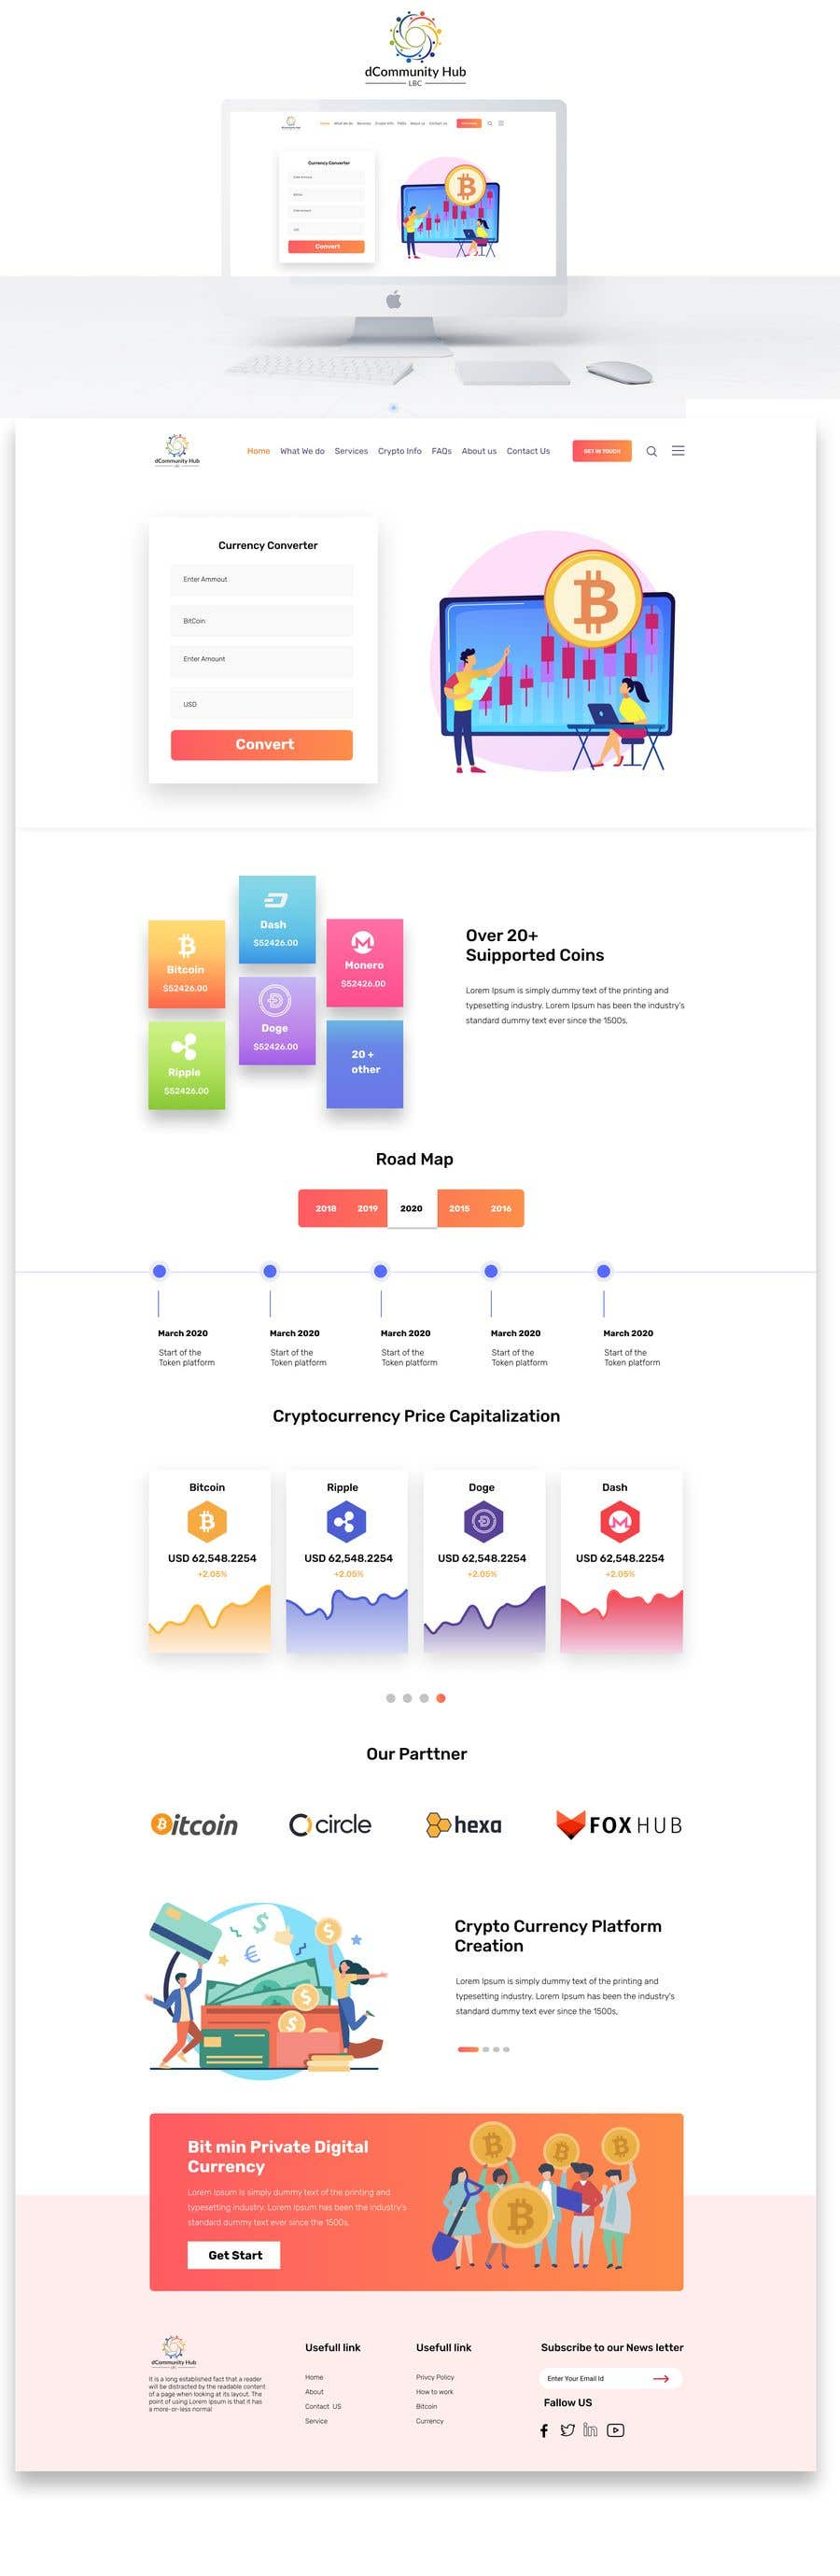 Penyertaan Peraduan #                                        15                                      untuk                                         Contest – Crypto Information Website Section: $100